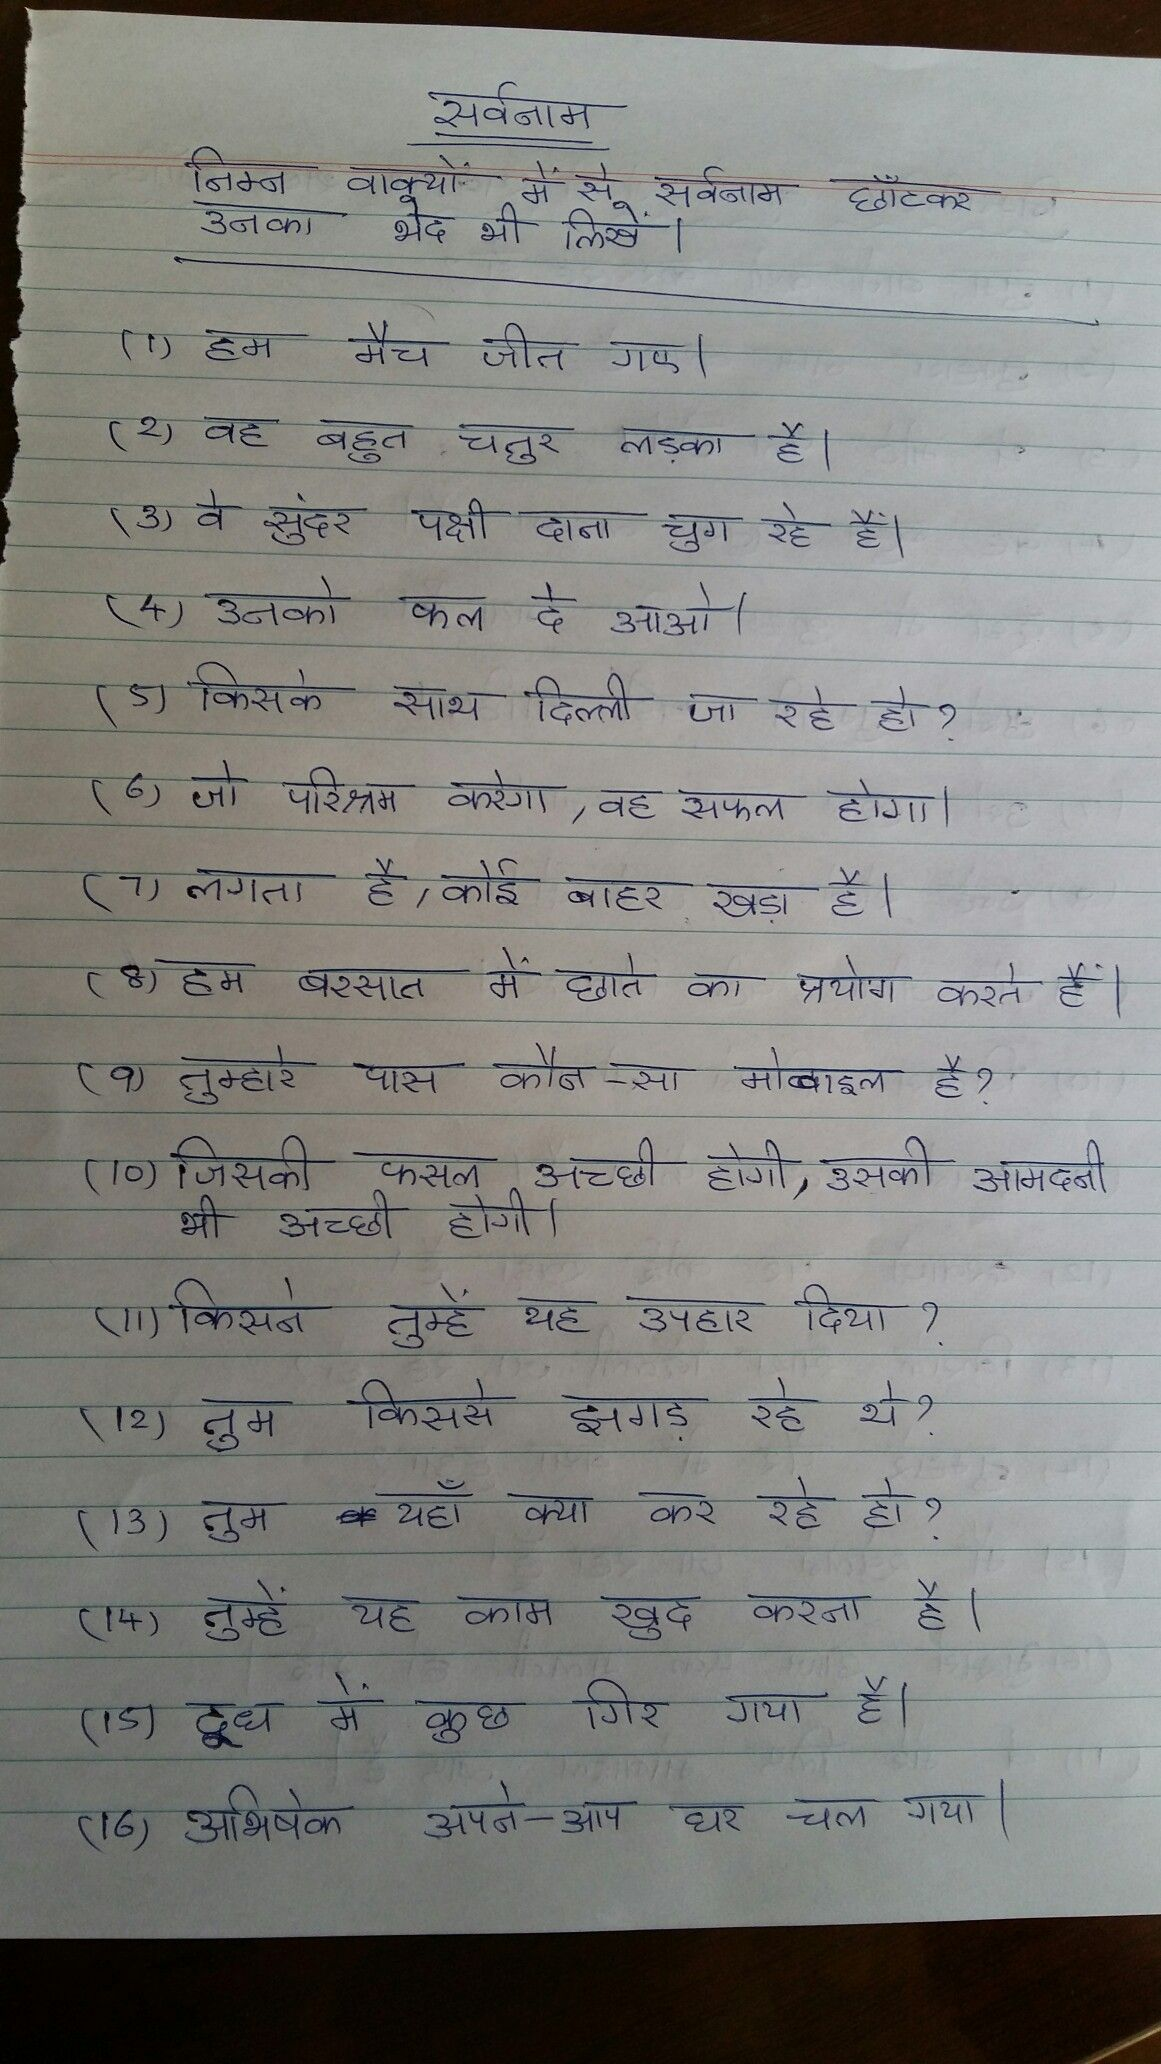 Hindi Worksheet For Pp2